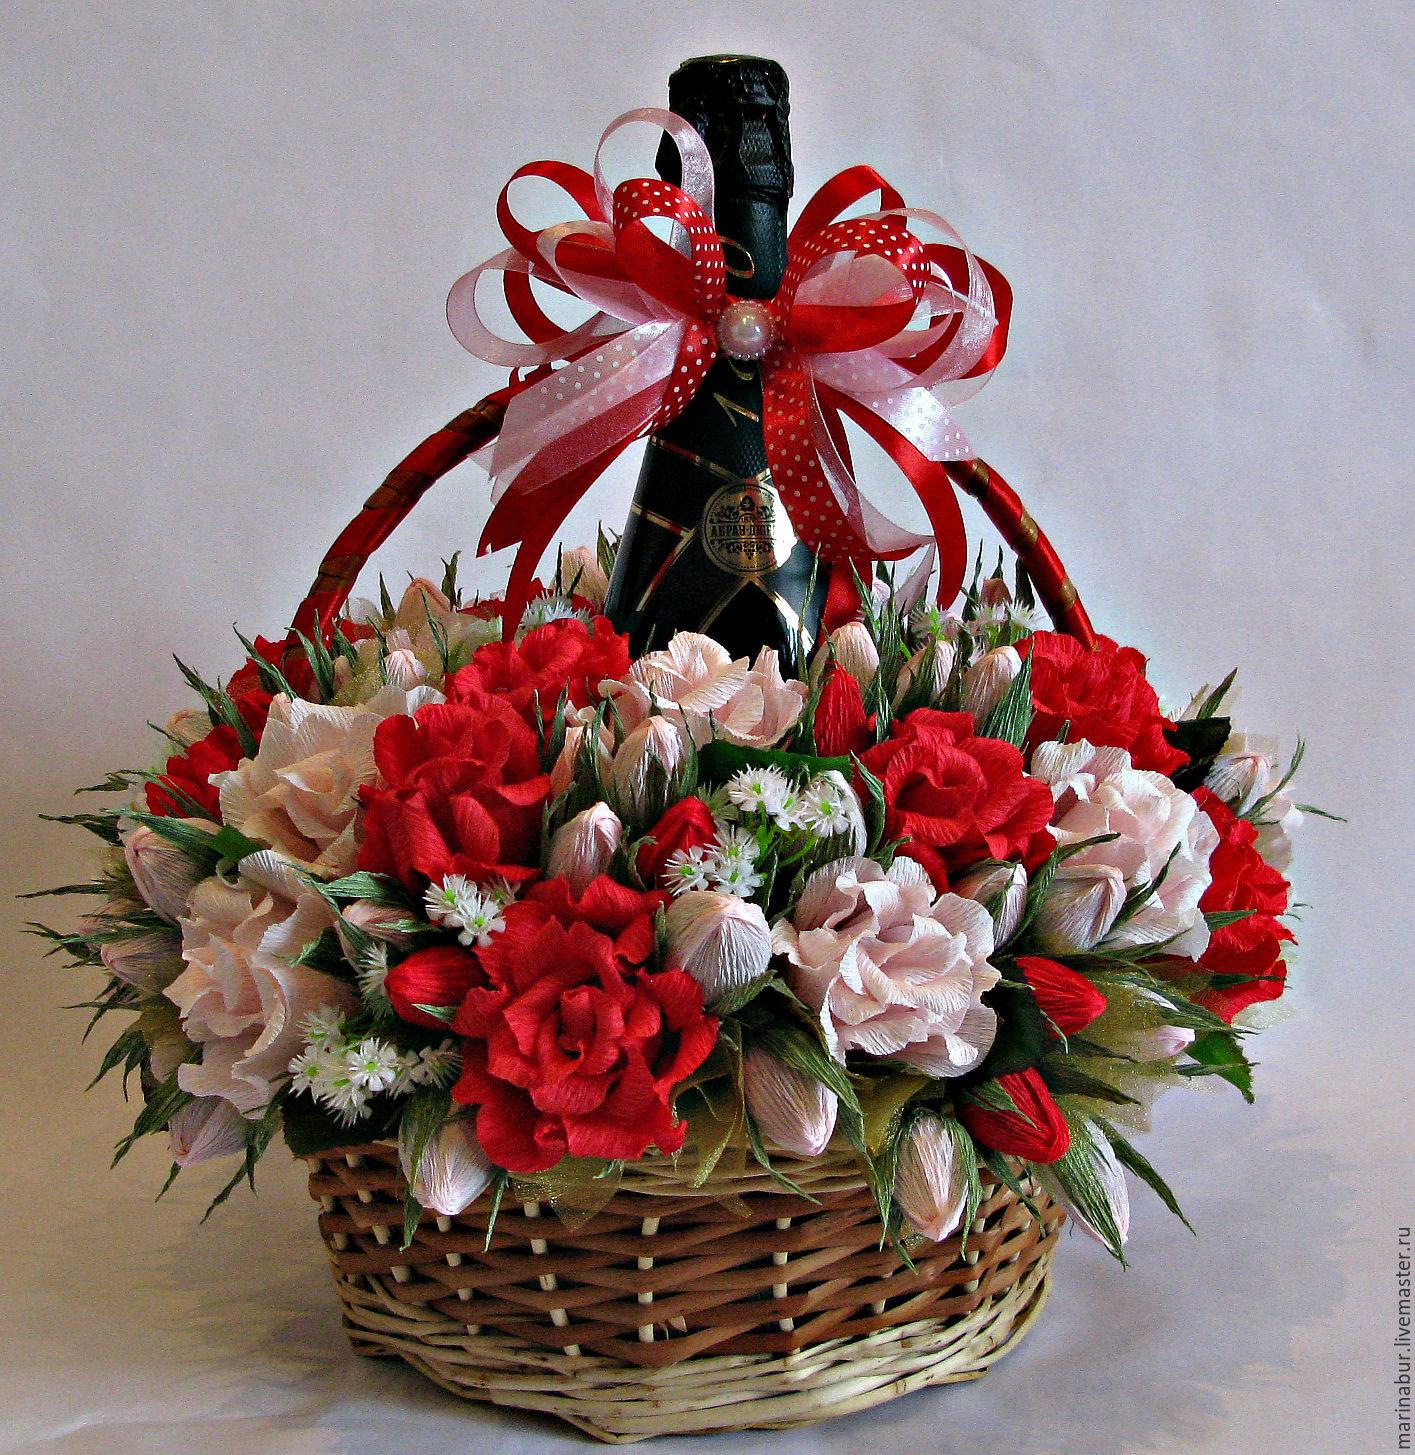 Подарочная корзина с розами, Корзины, Москва,  Фото №1